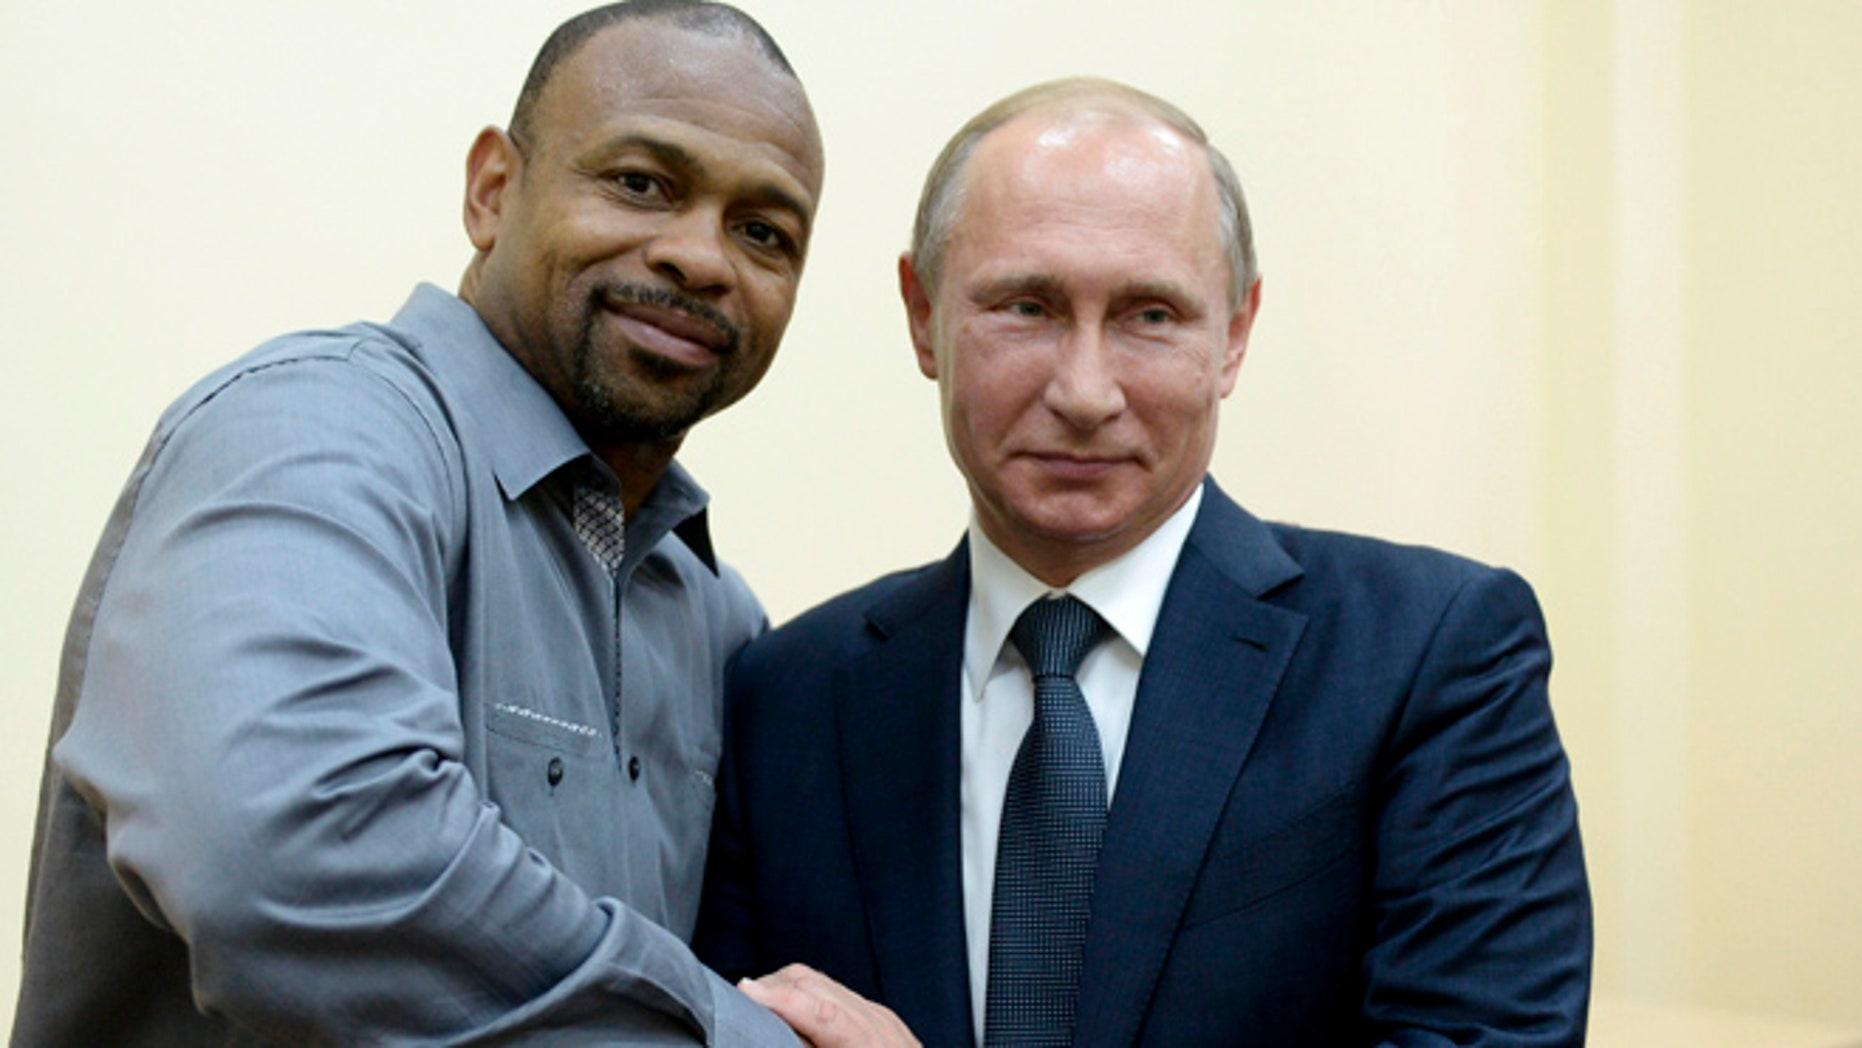 Aug. 19, 2015: Russian President Vladimir Putin, right, meets with American boxer Roy Jones Jr. in Sevastopol, Crimea.